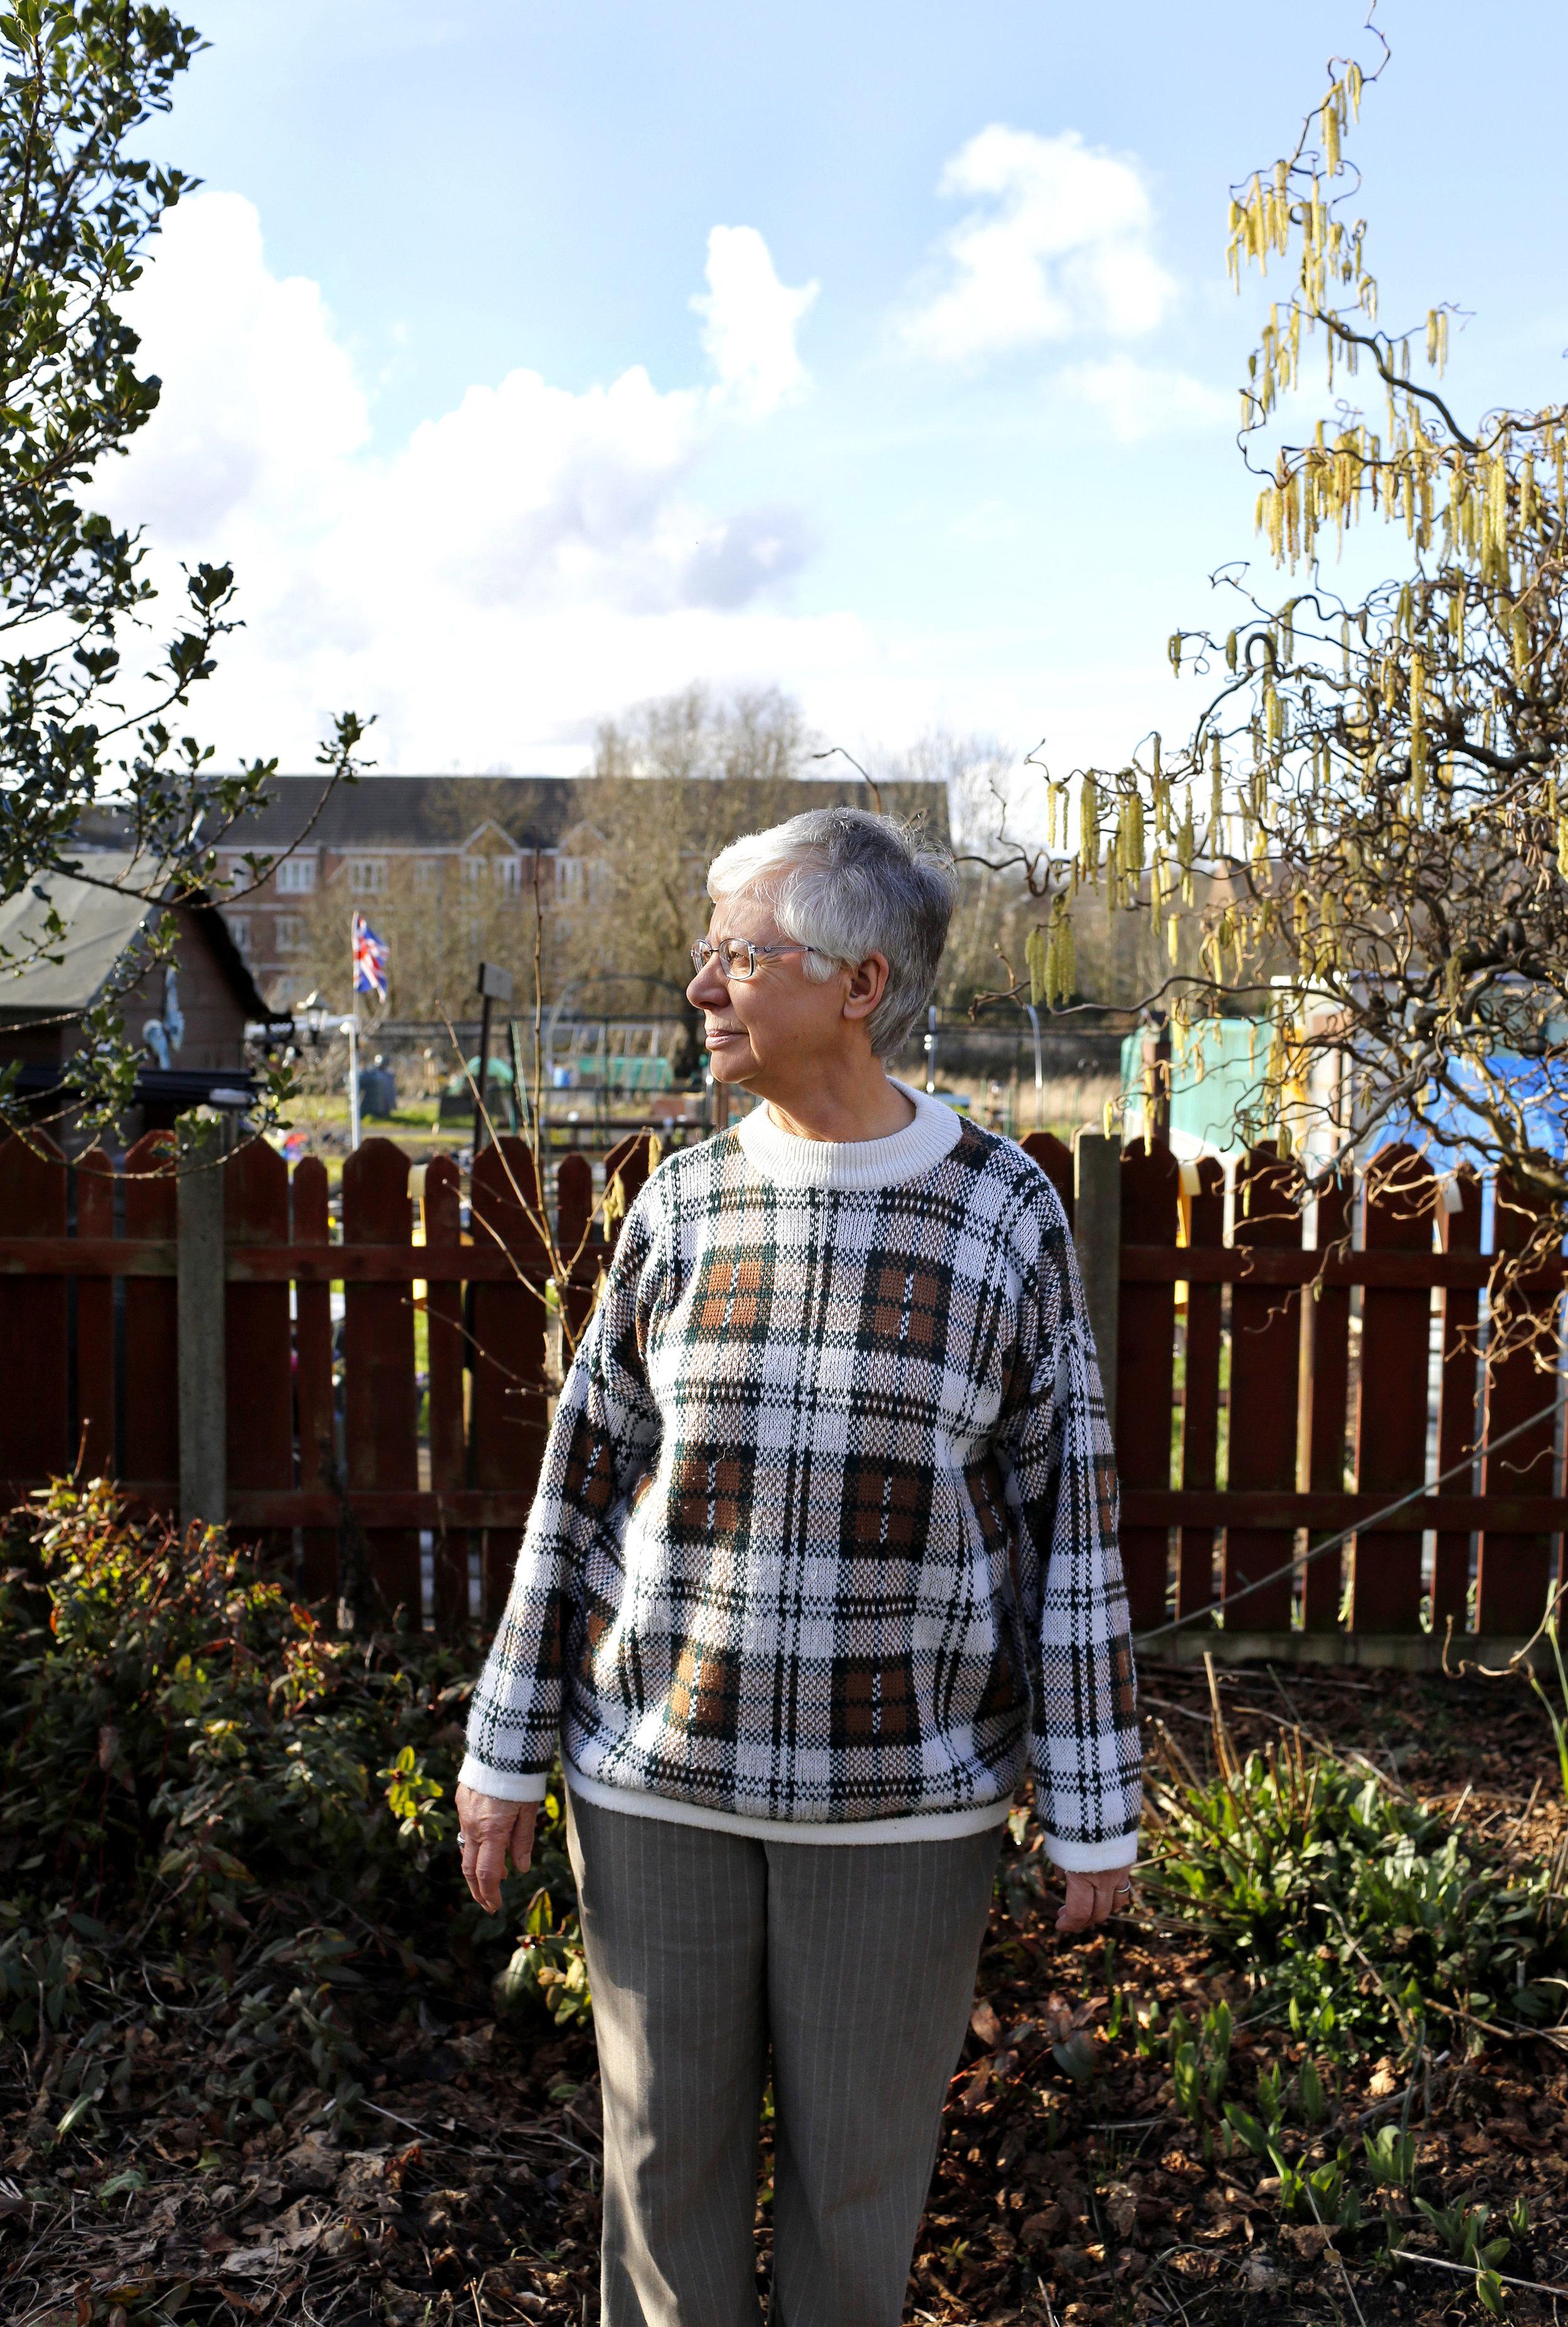 Hazel Griffiths in her garden in Austin Village. Photographed March 2018 by Stephen Burke.